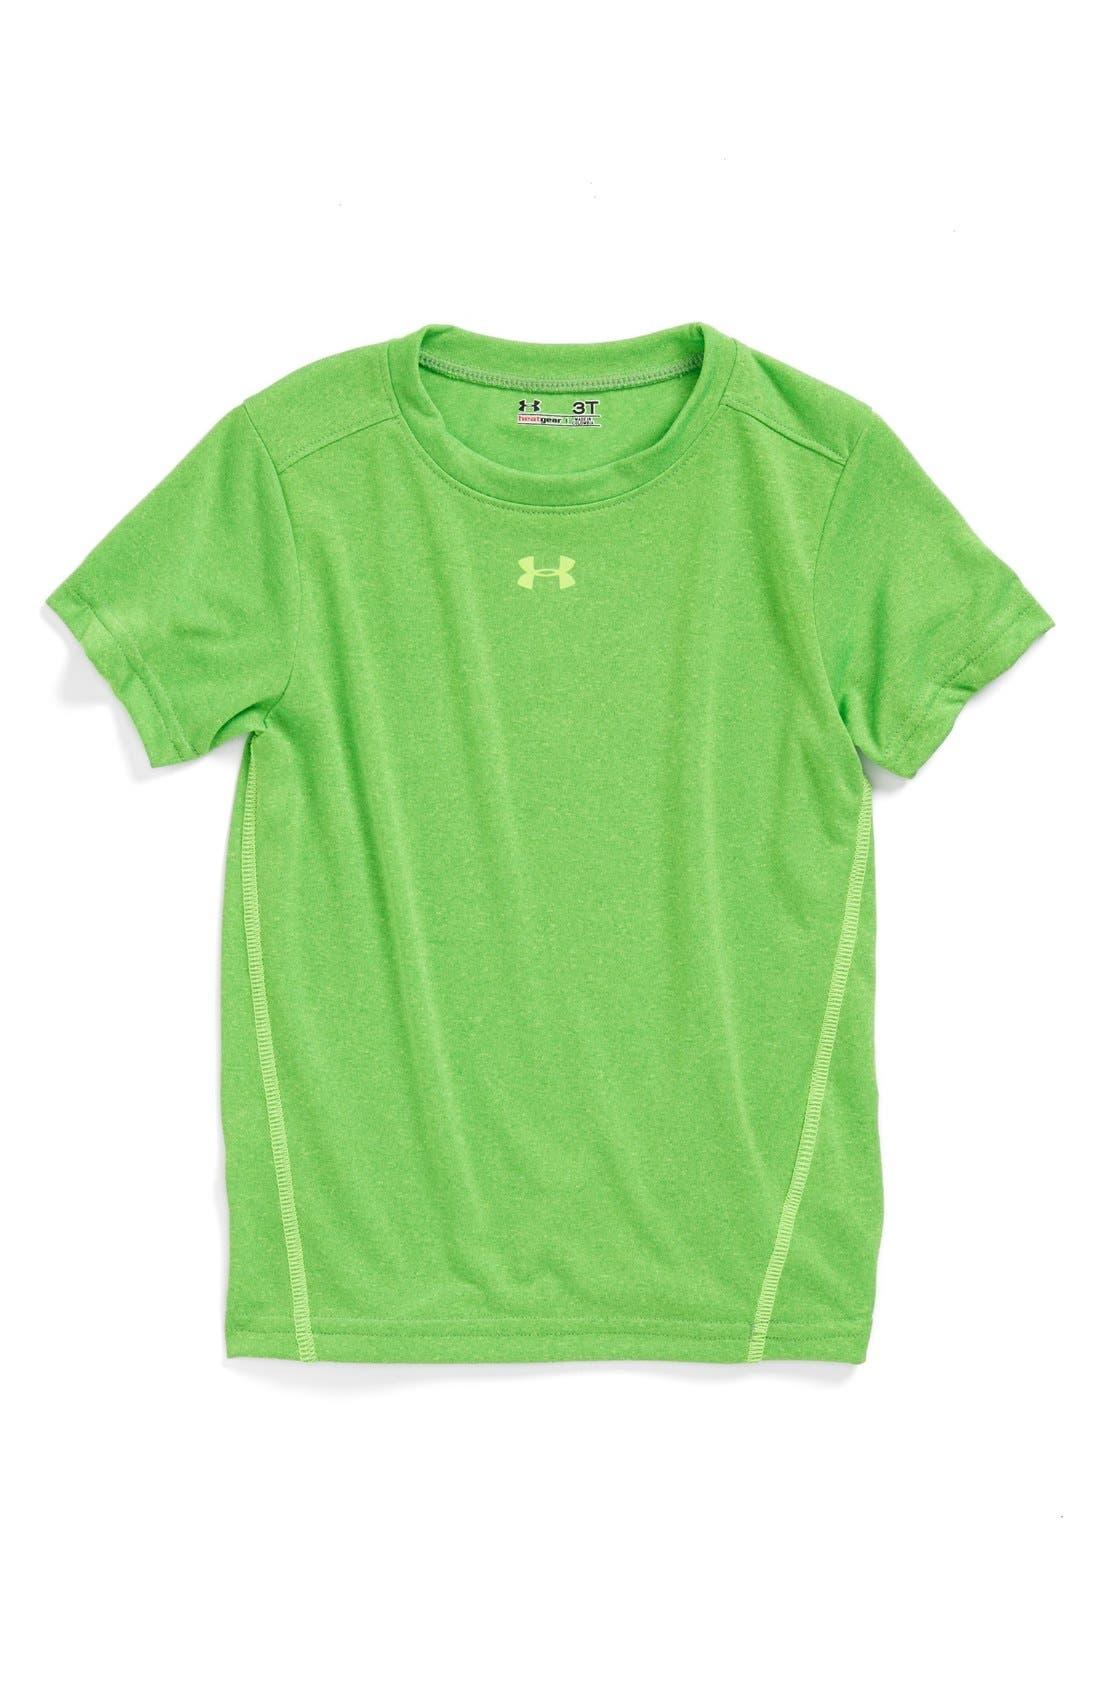 Main Image - Under Armour 'Commingled' HeatGear® T-Shirt (Toddler Boys)